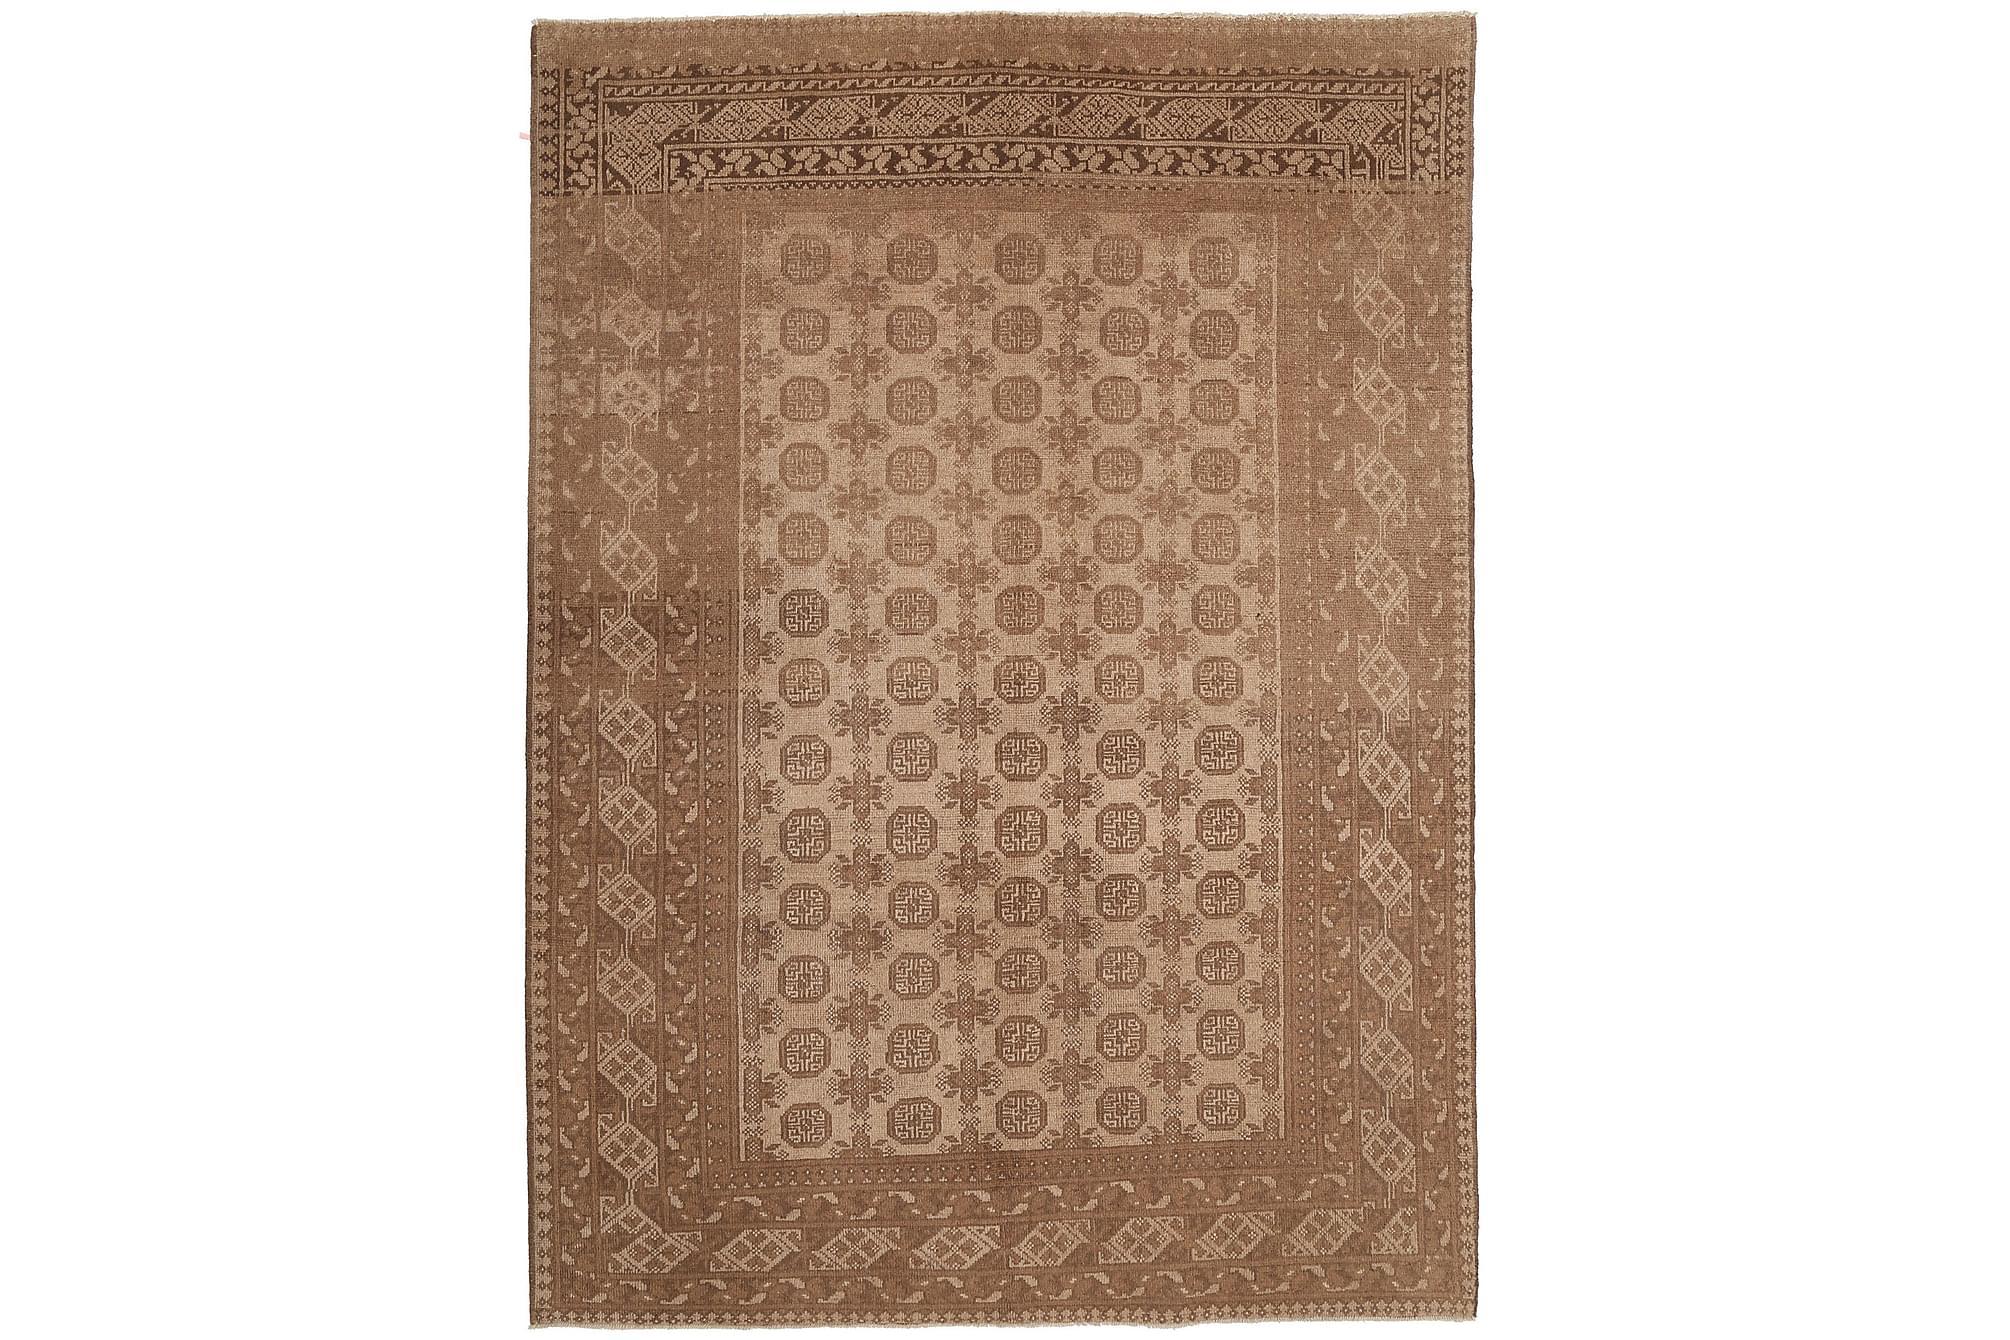 AFGHAN Matta 196x277 Stor Beige/Brun, Orientaliska mattor